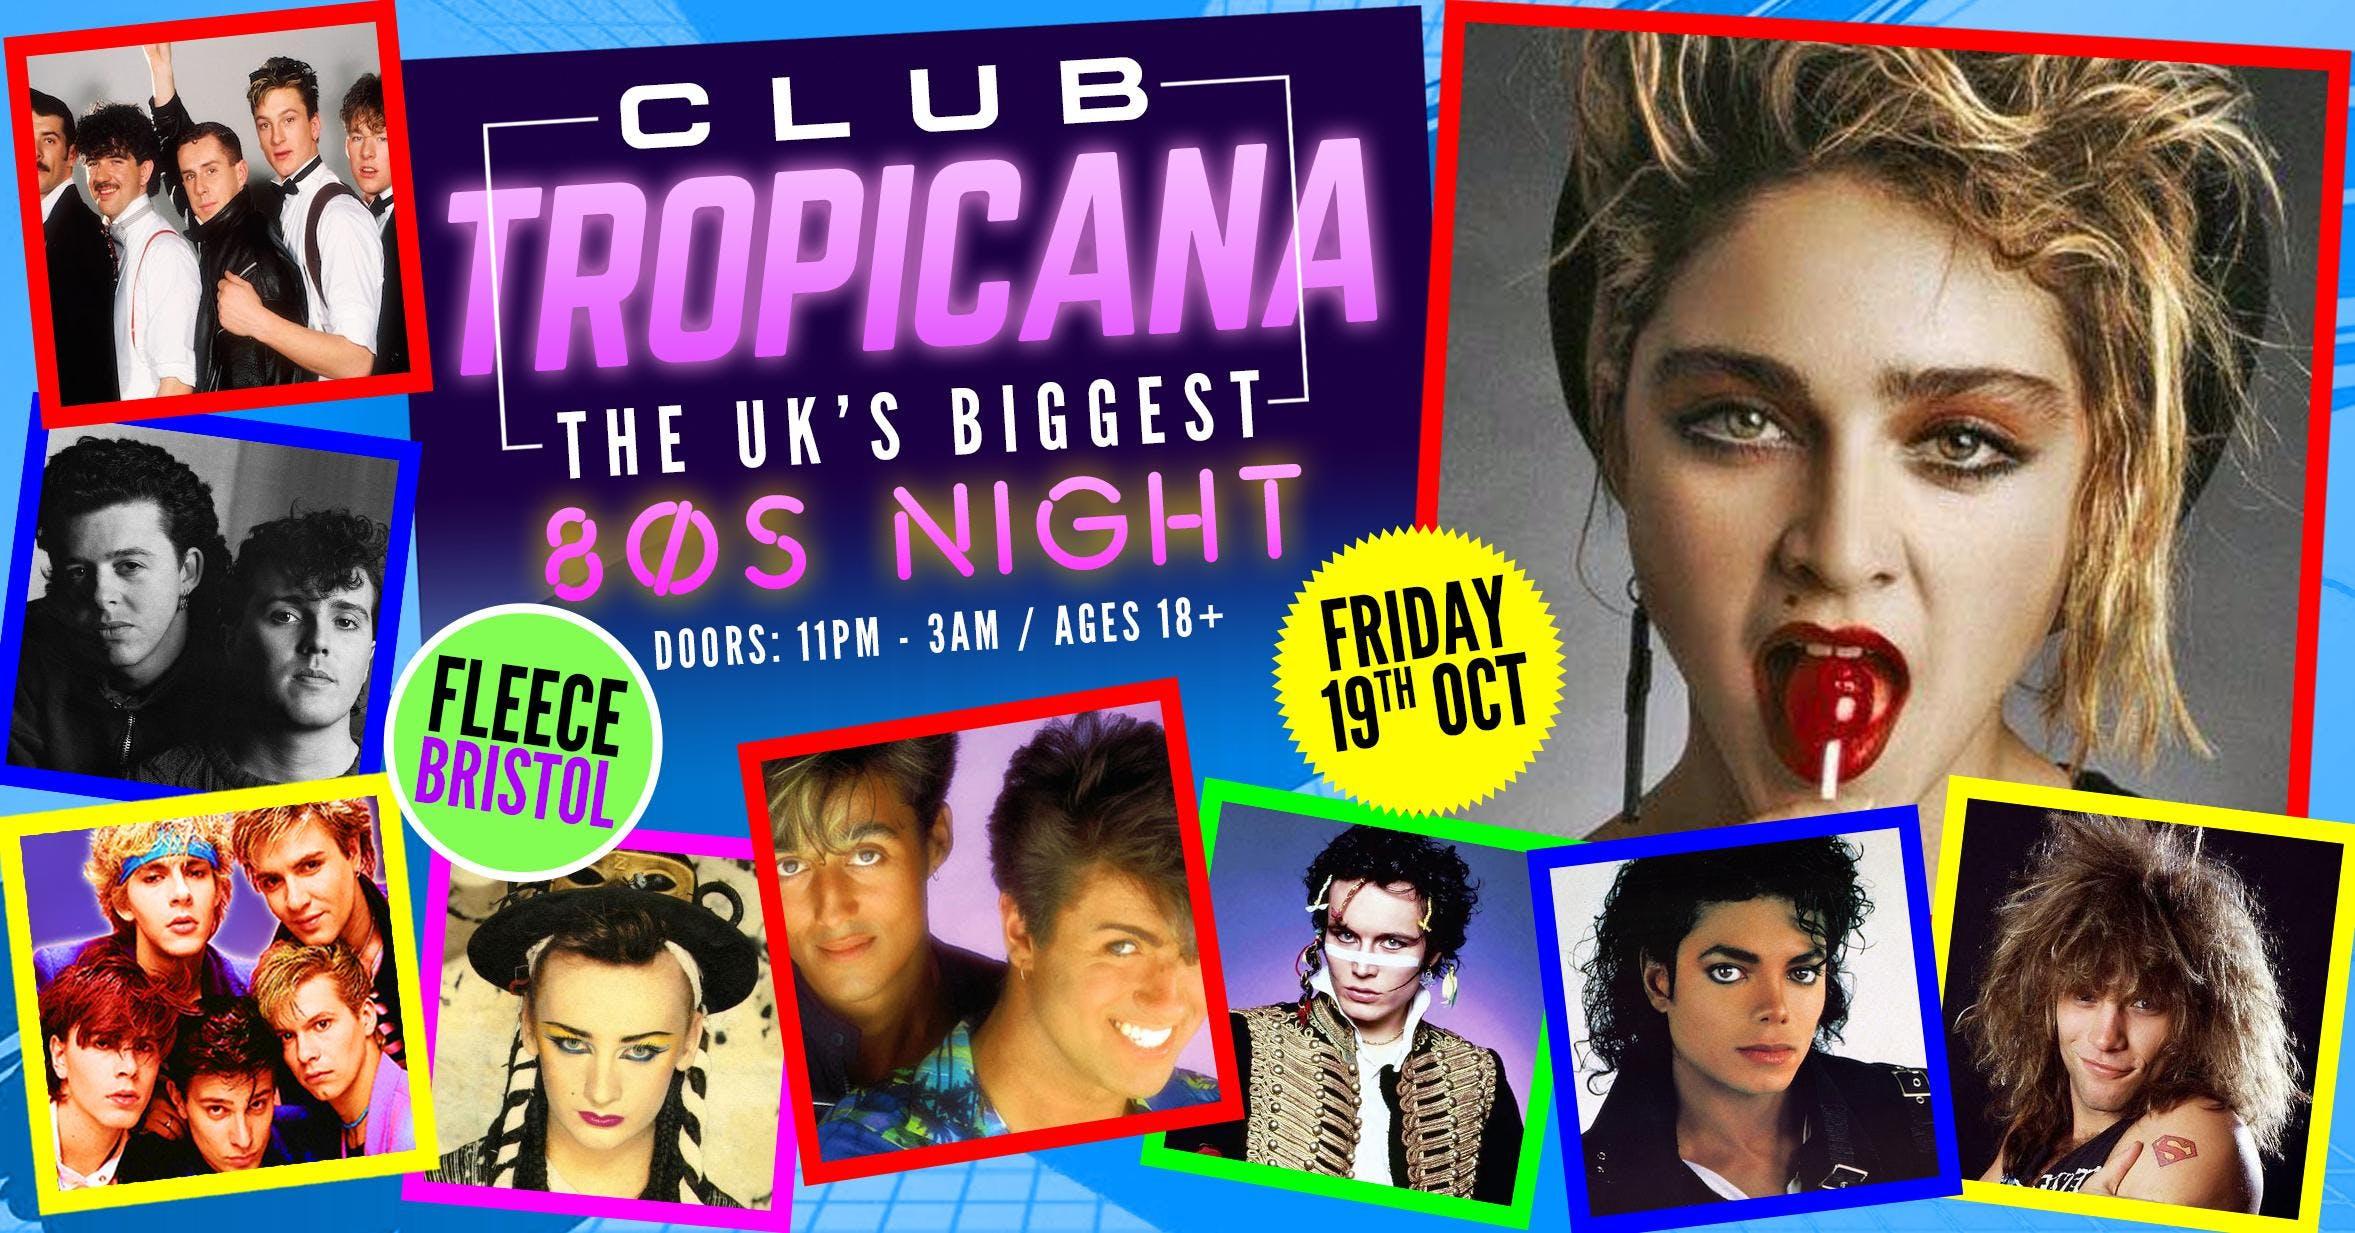 Club Tropicana - The UK's Biggest 80s Night!